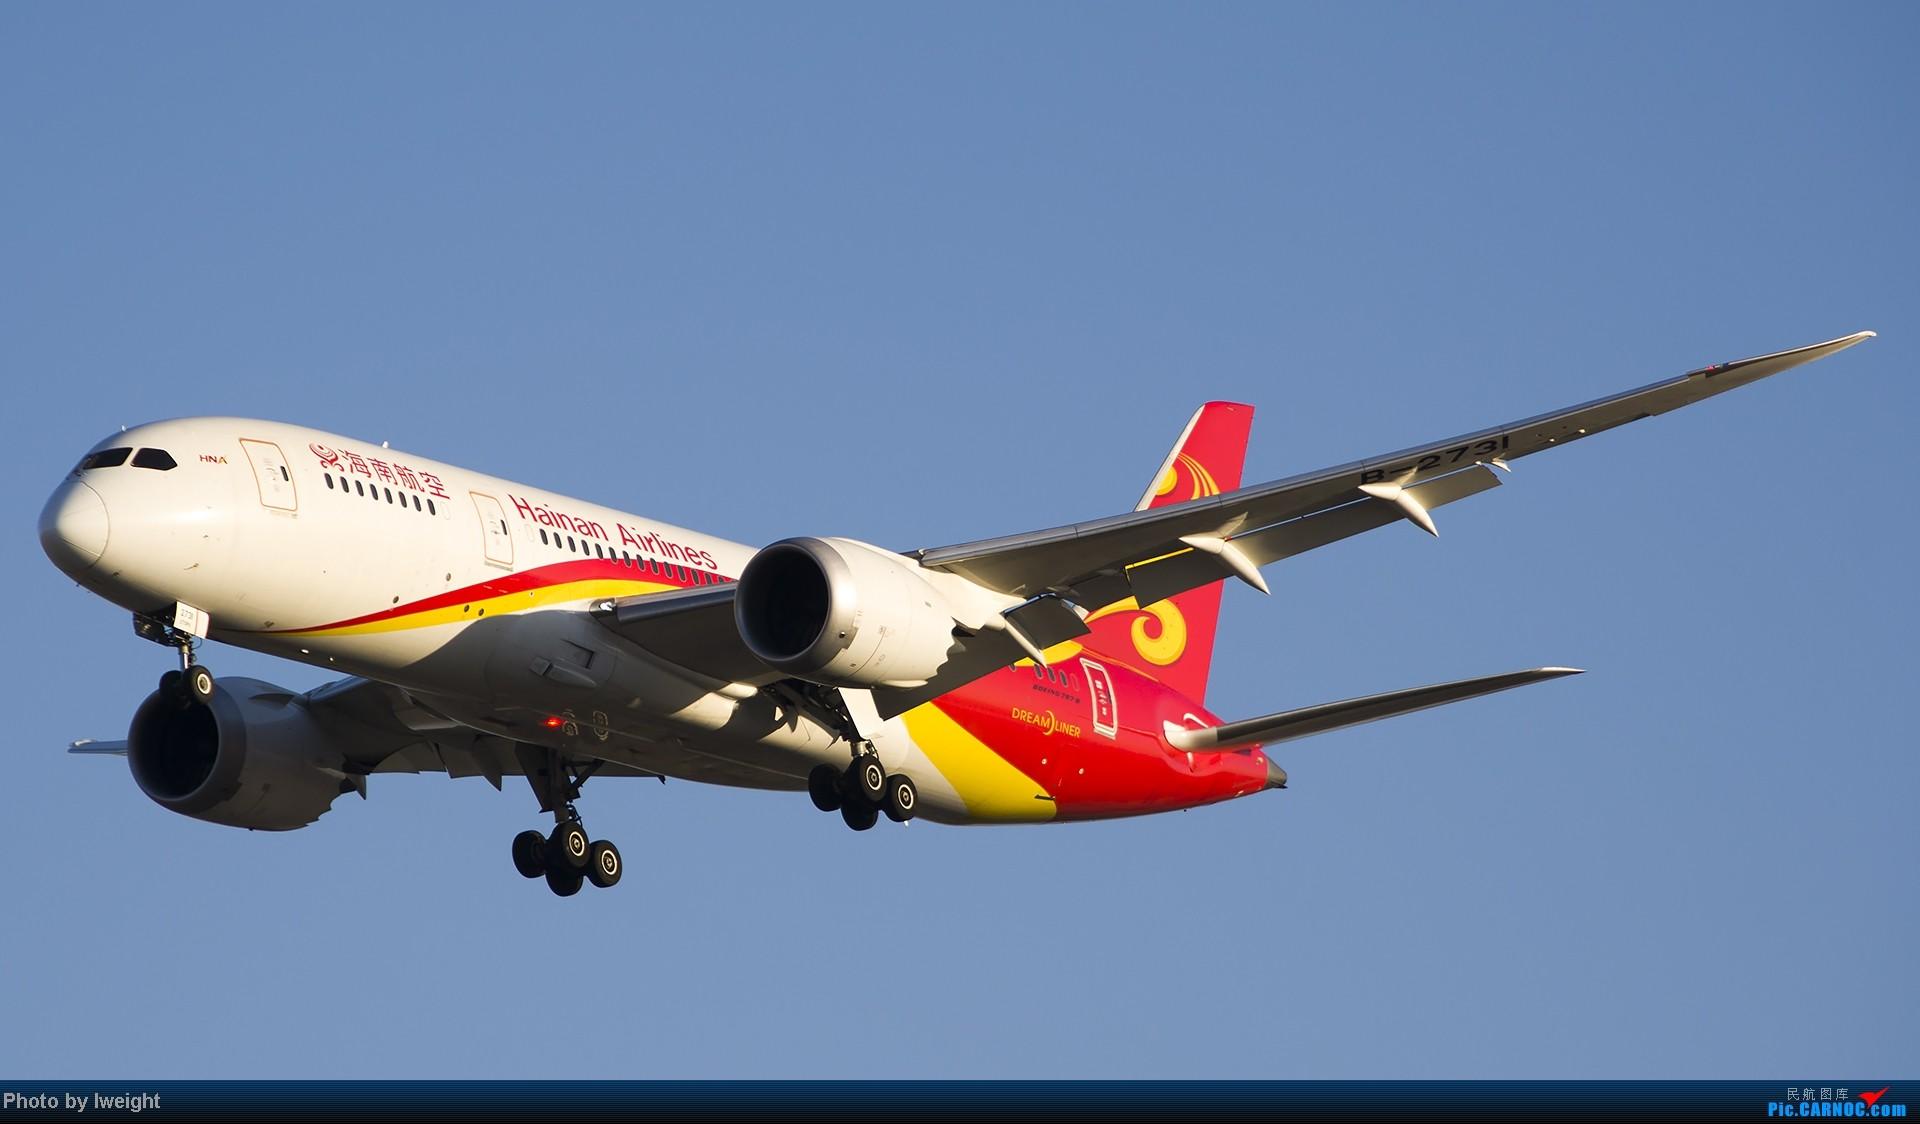 Re:[原创]抓住APEC蓝的尾巴,再拍上一组 BOEING 787-8 B-2731 中国北京首都机场